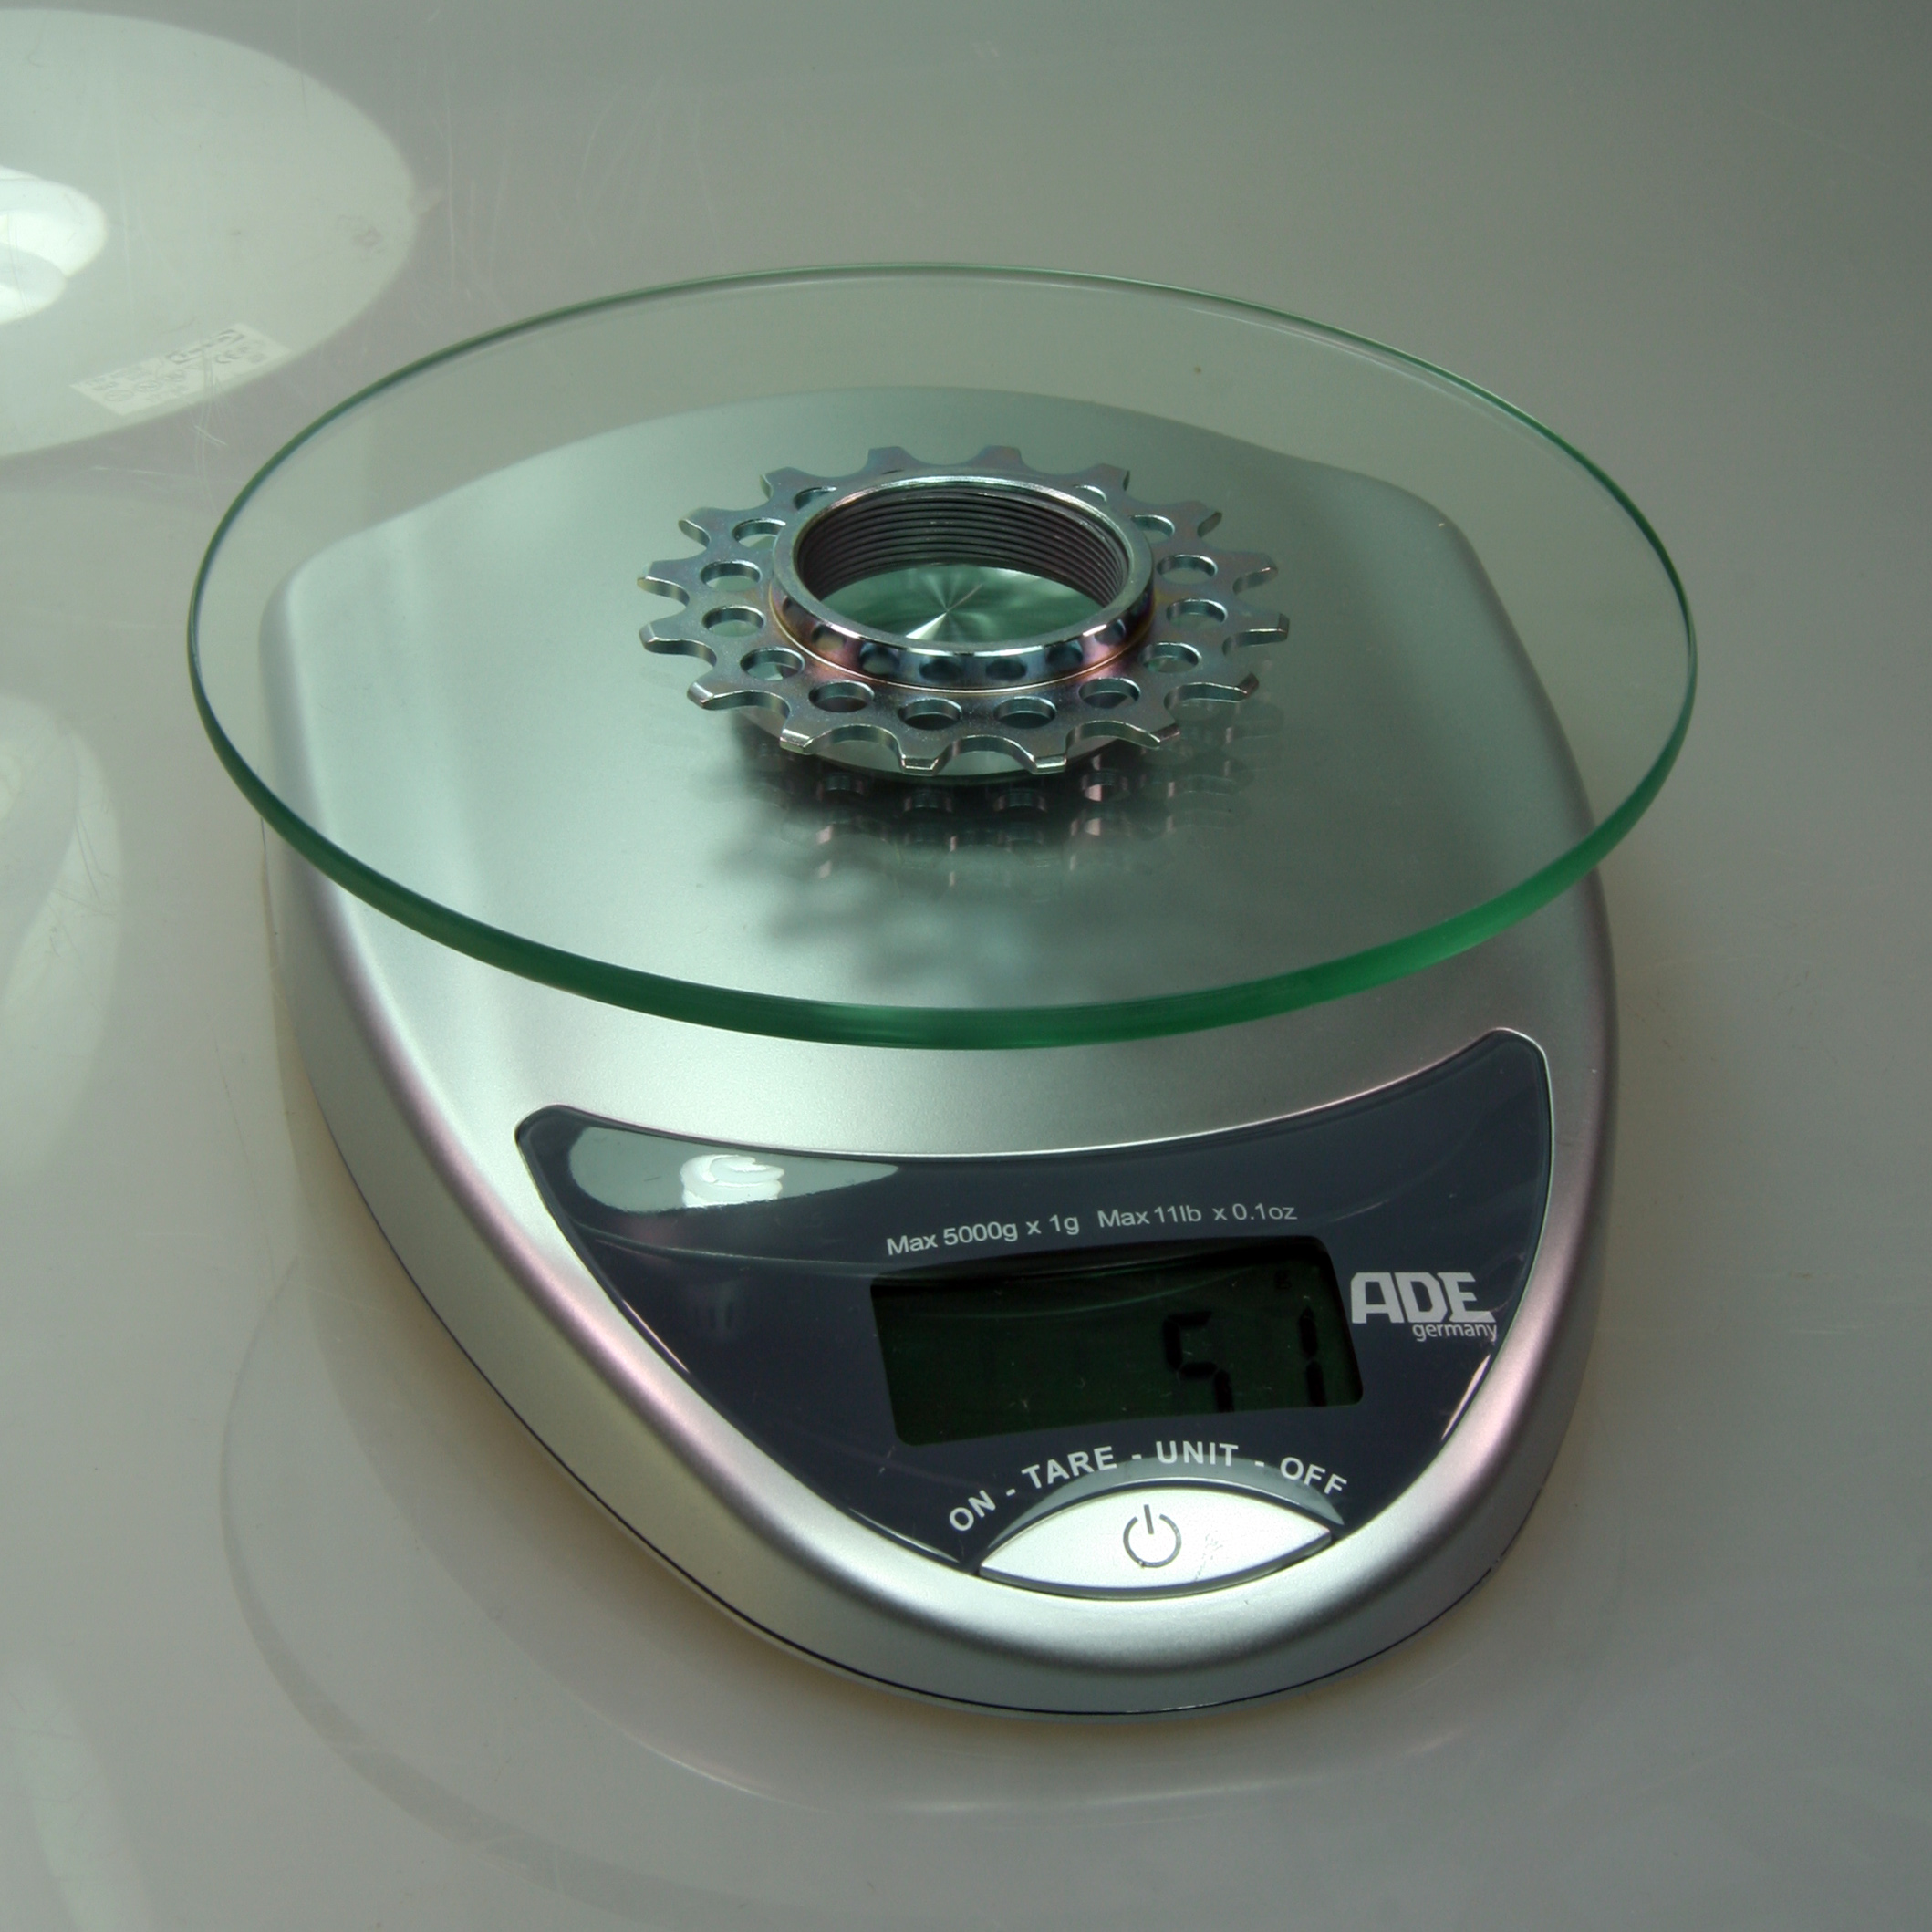 Nabenvergleich-rohloff-speedhub-shimano-alfine-06.jpg